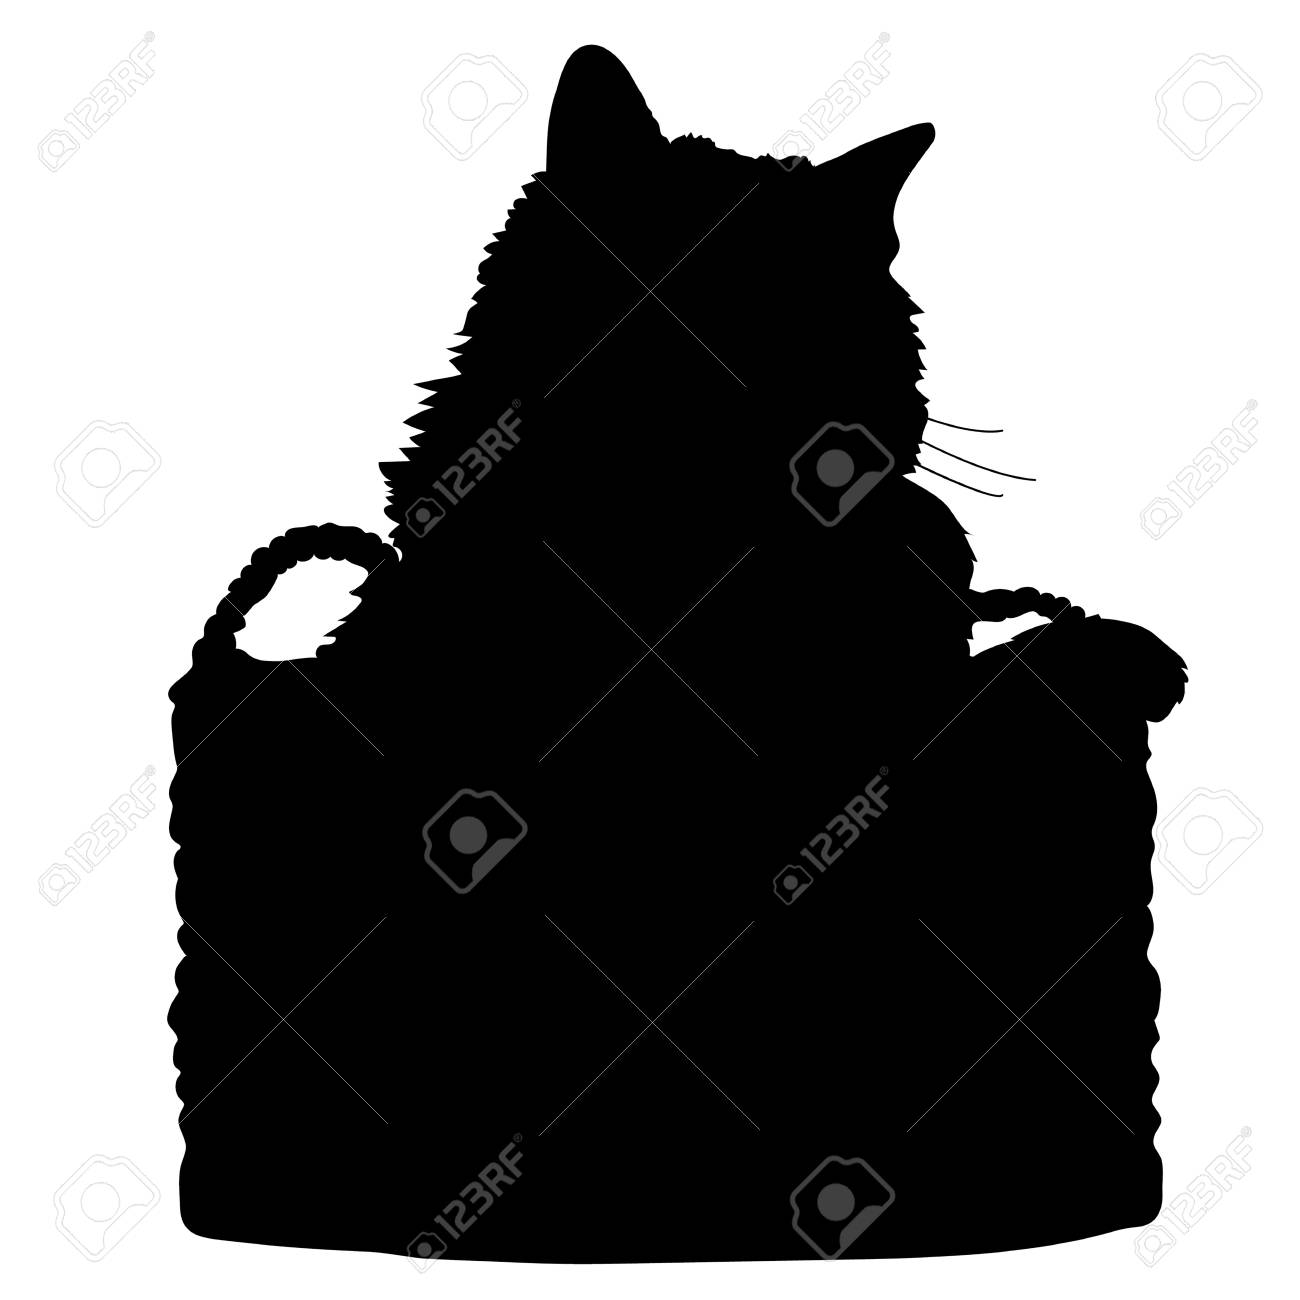 A black silhouette of a cat - 41855406